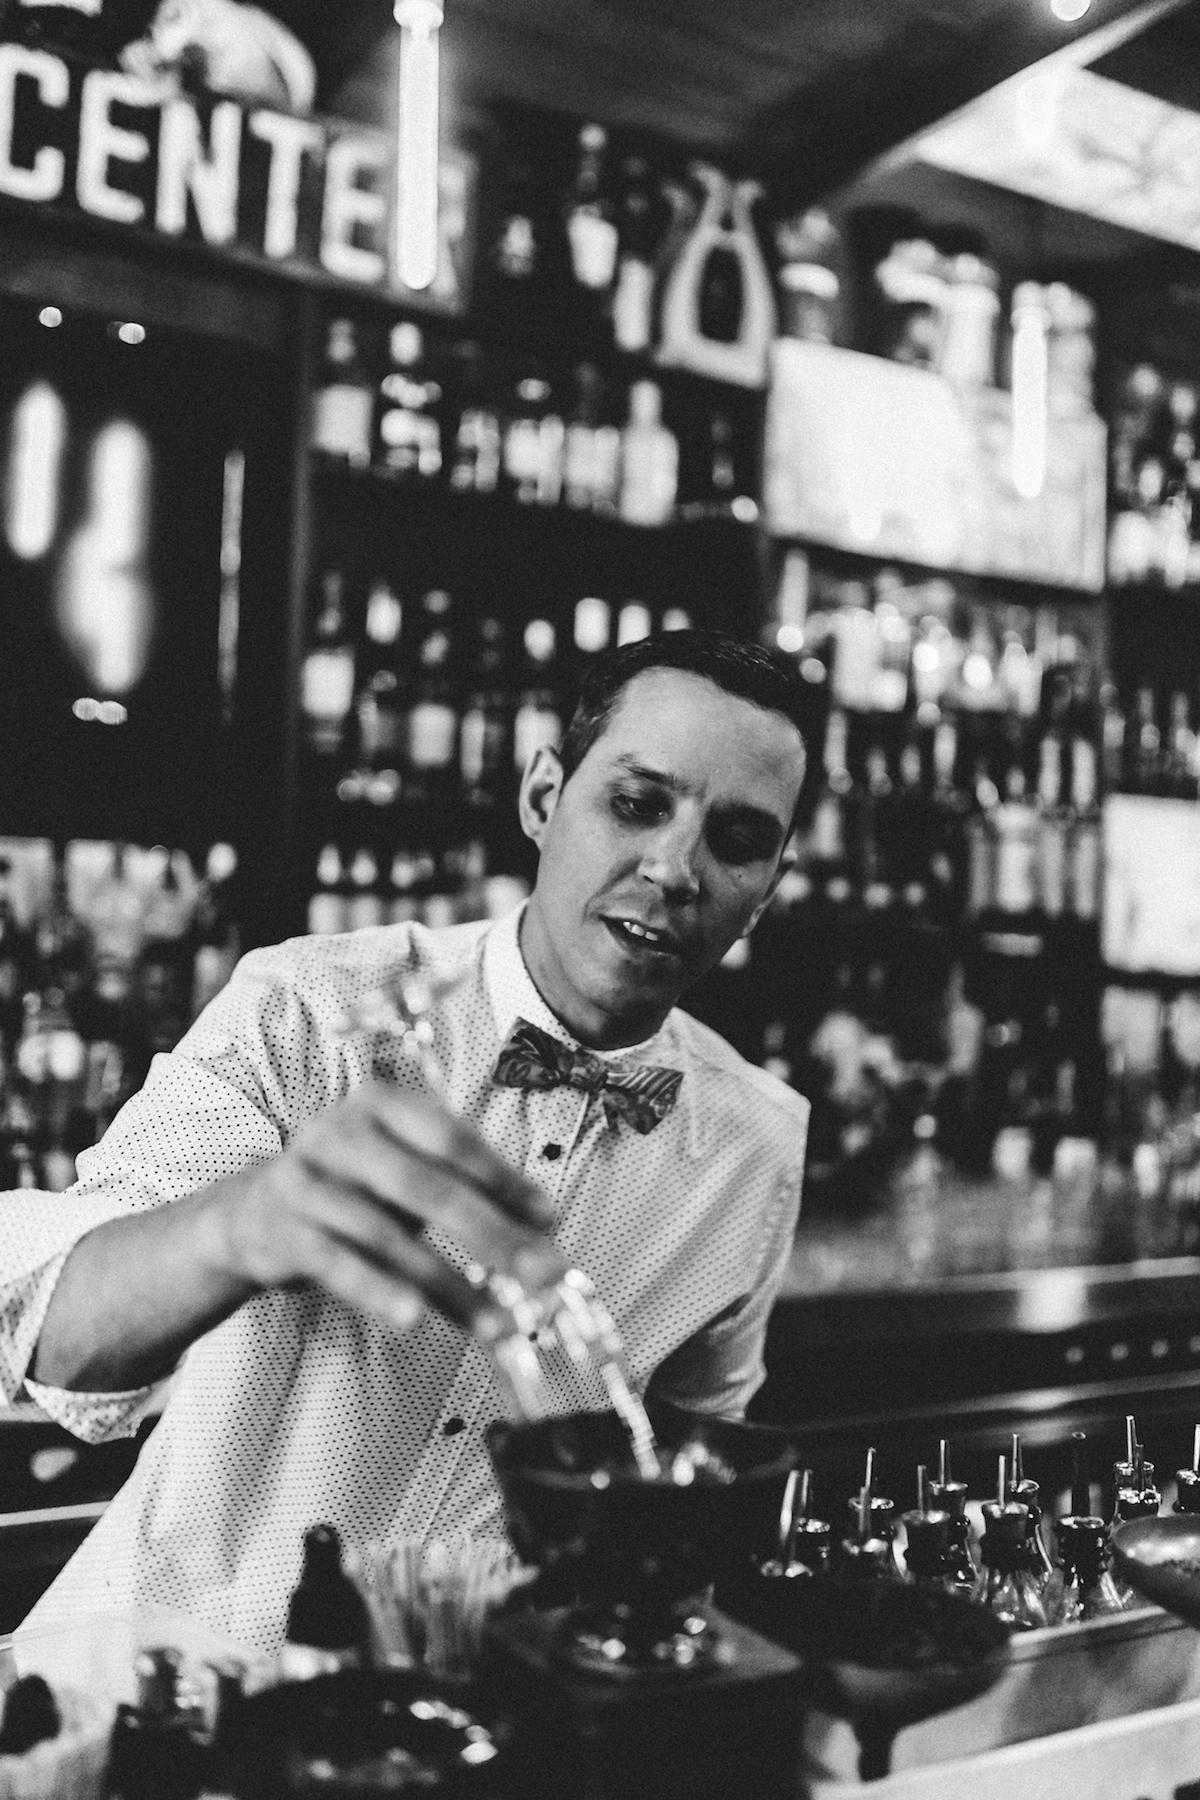 Portrait Keenan Hood at Keefer Bar in Vancouver